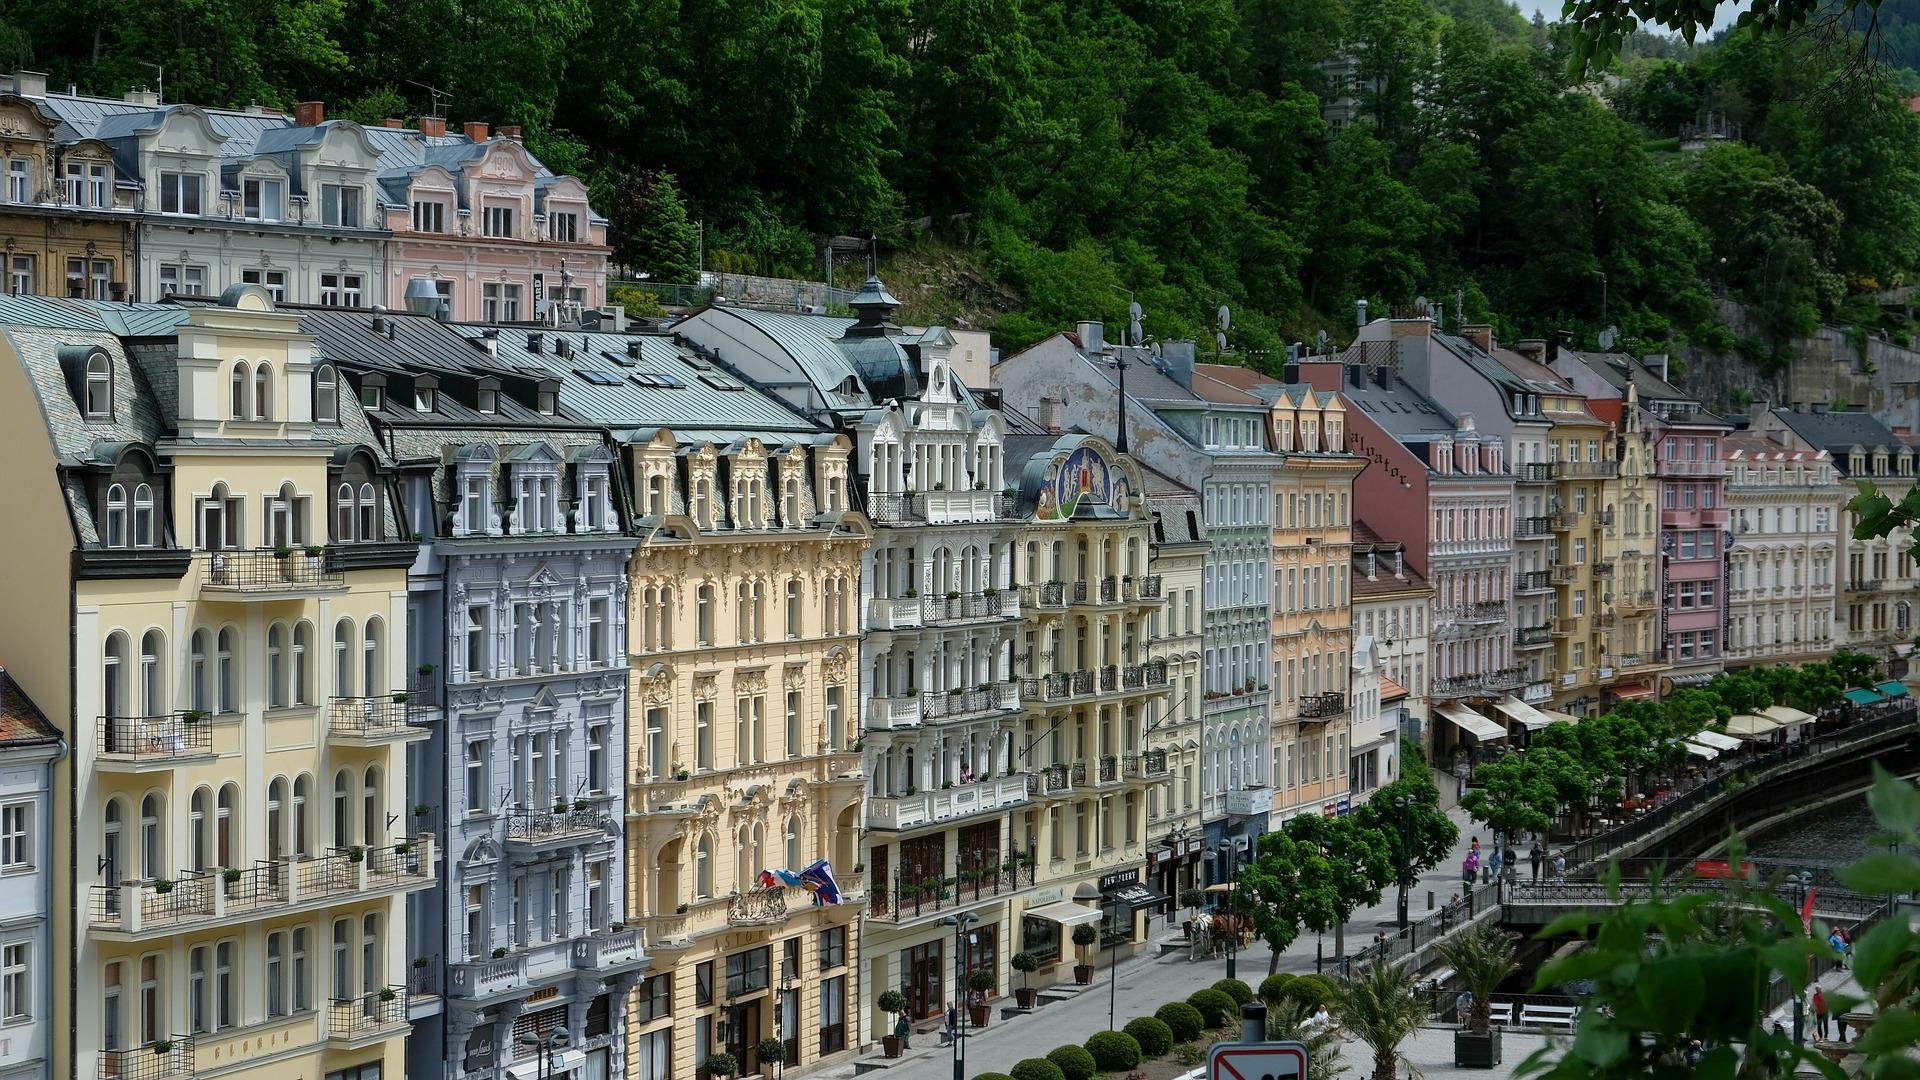 houses of Karlovy Vary